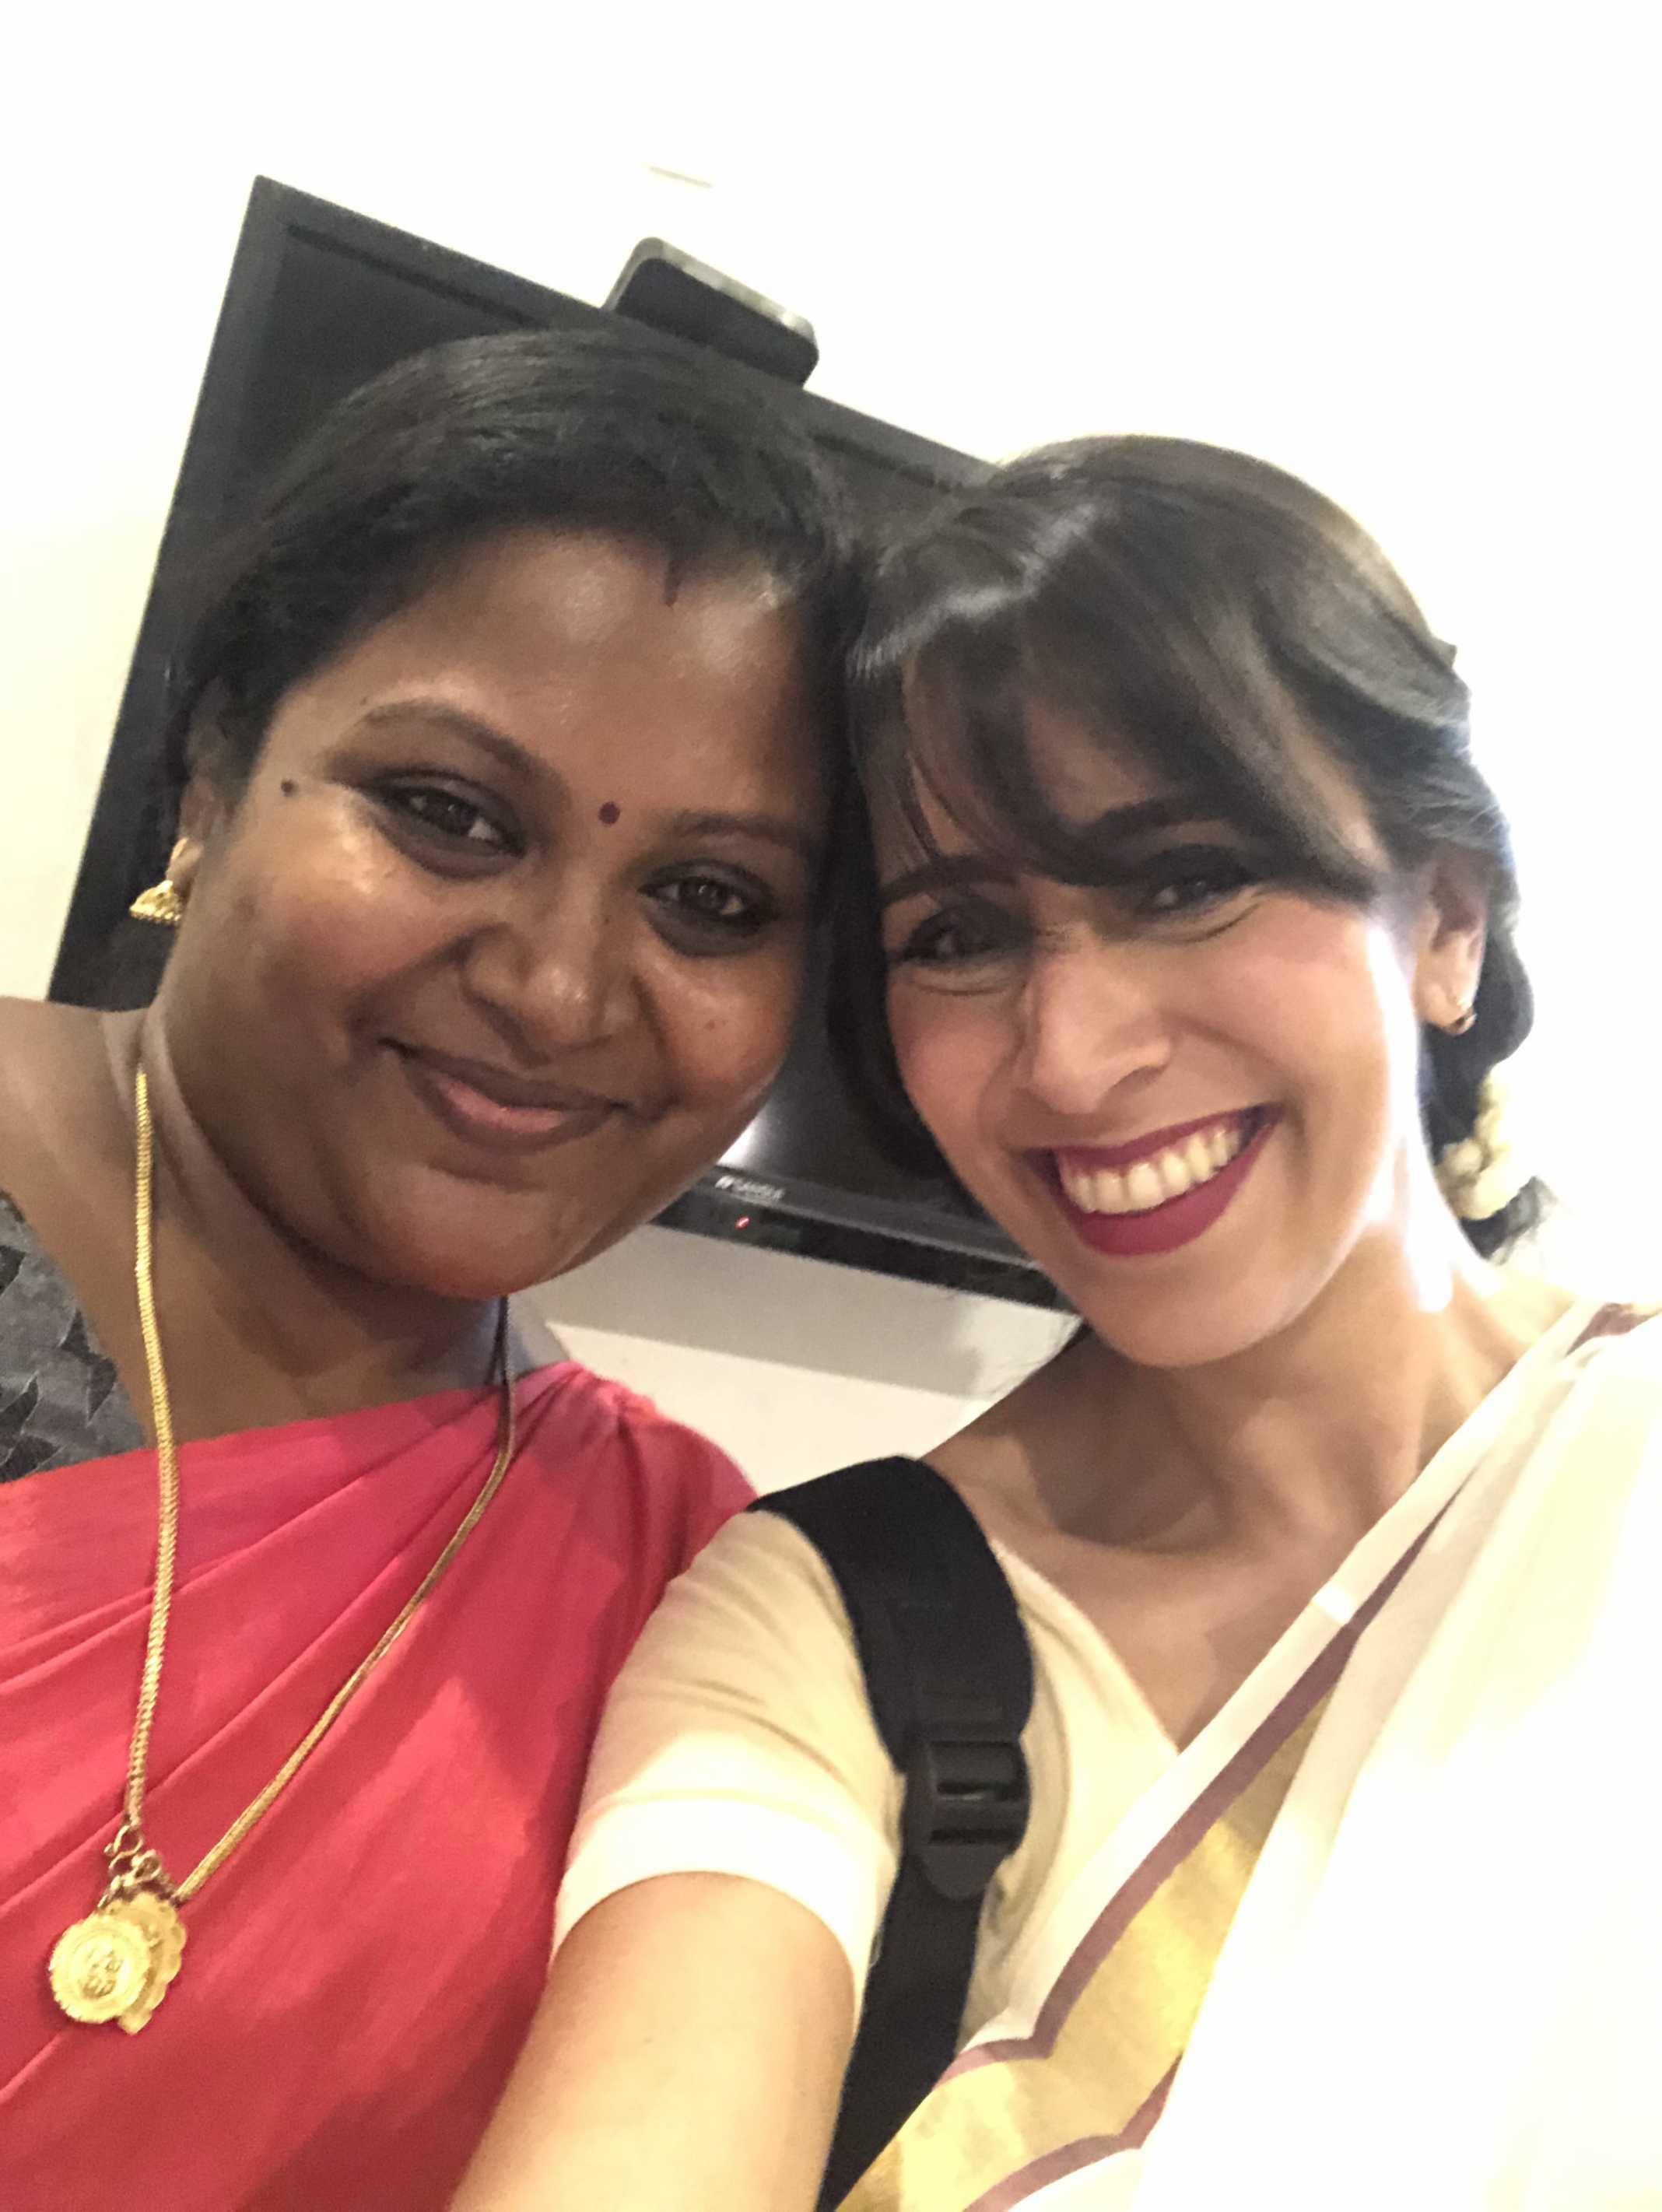 Estilo das mulheres da Índia